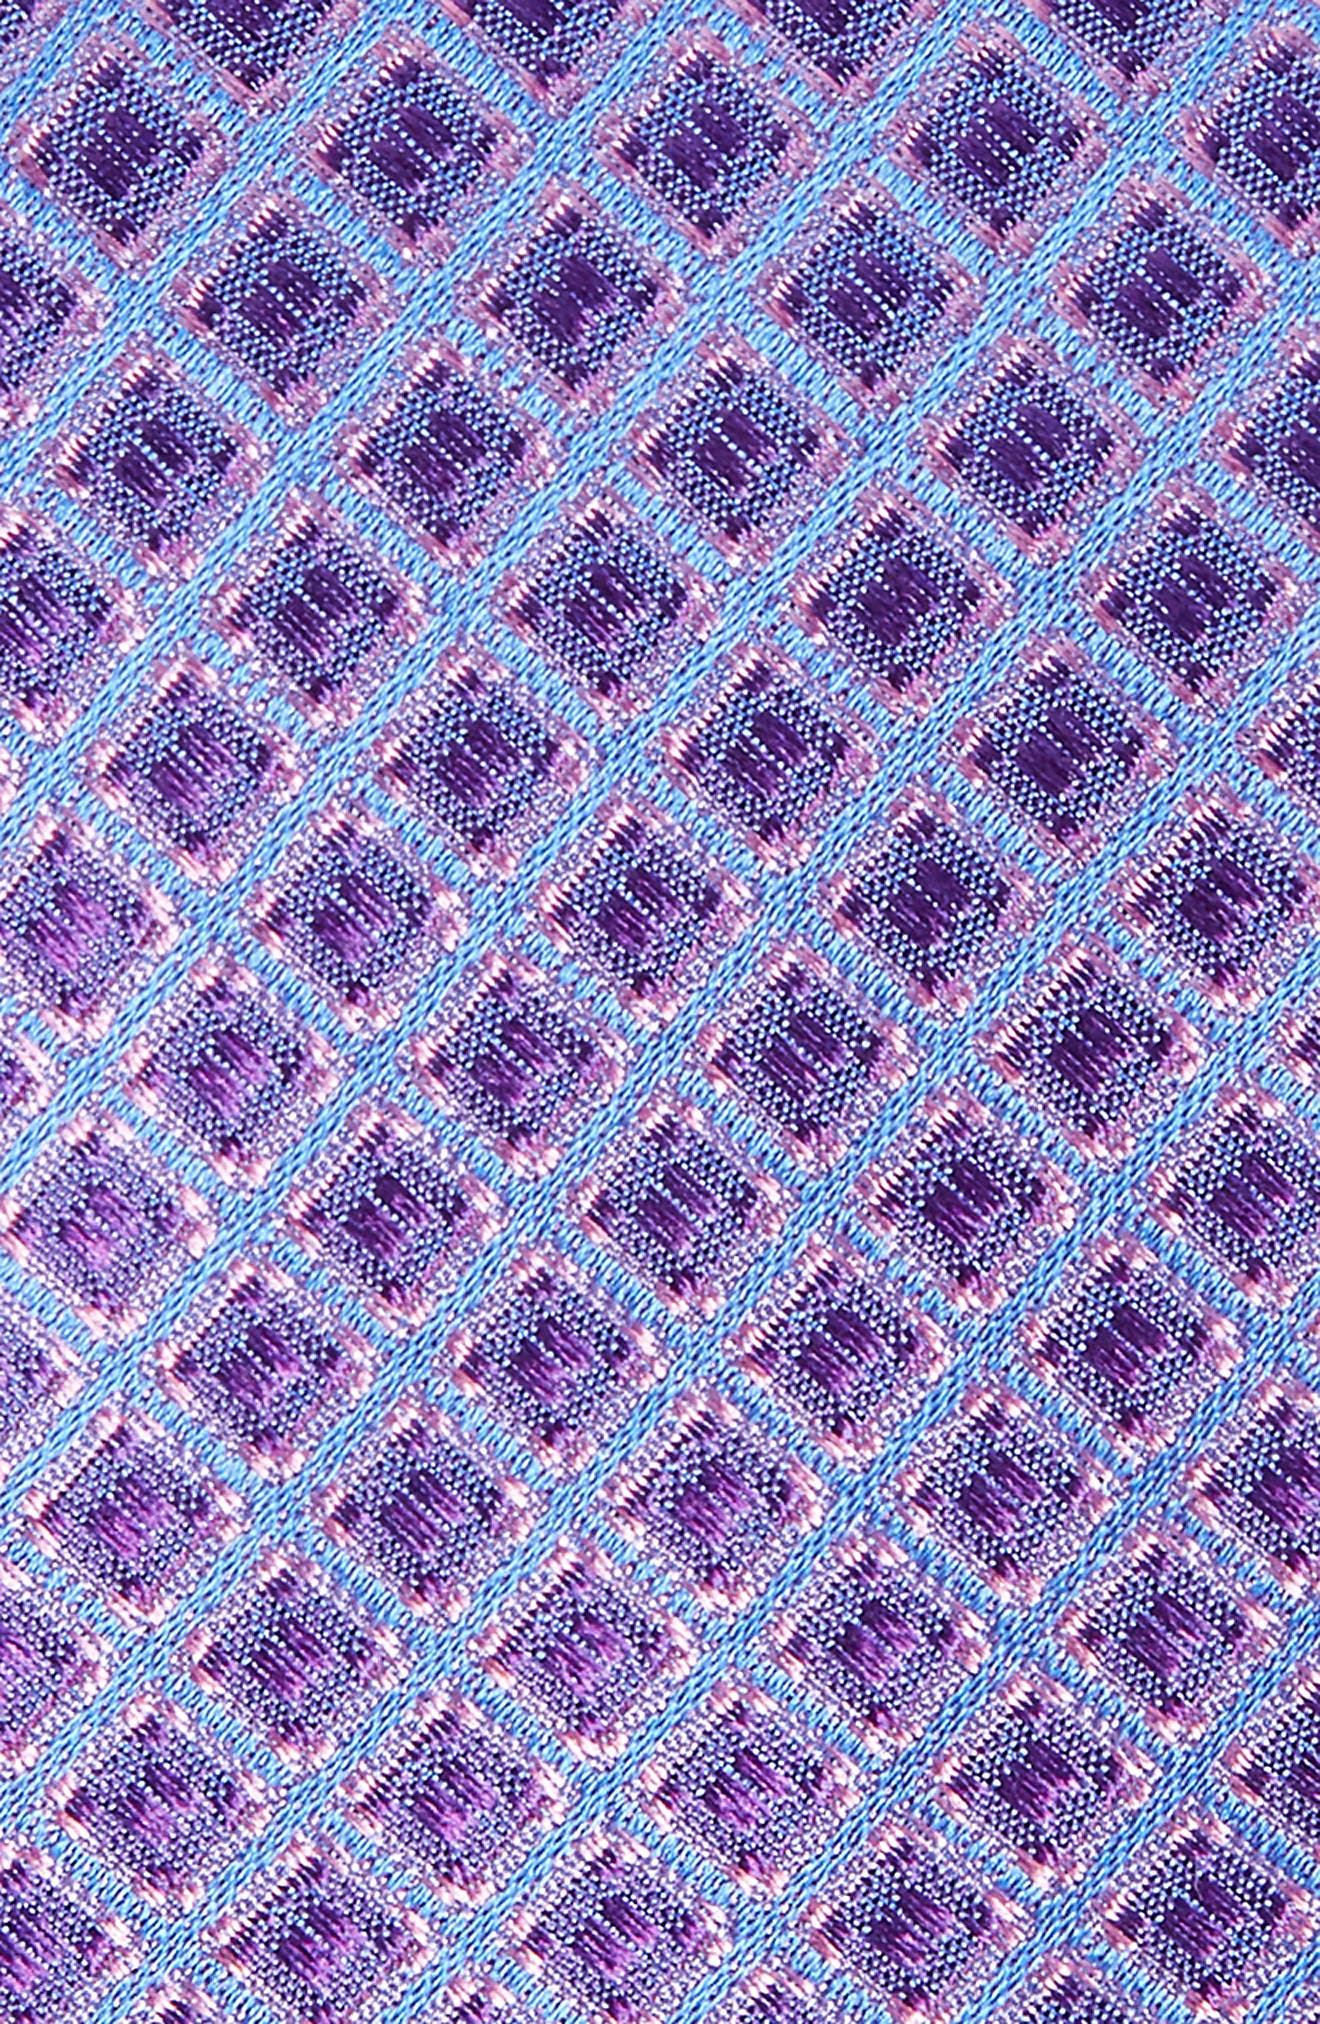 Denberg Check Silk Tie,                             Alternate thumbnail 7, color,